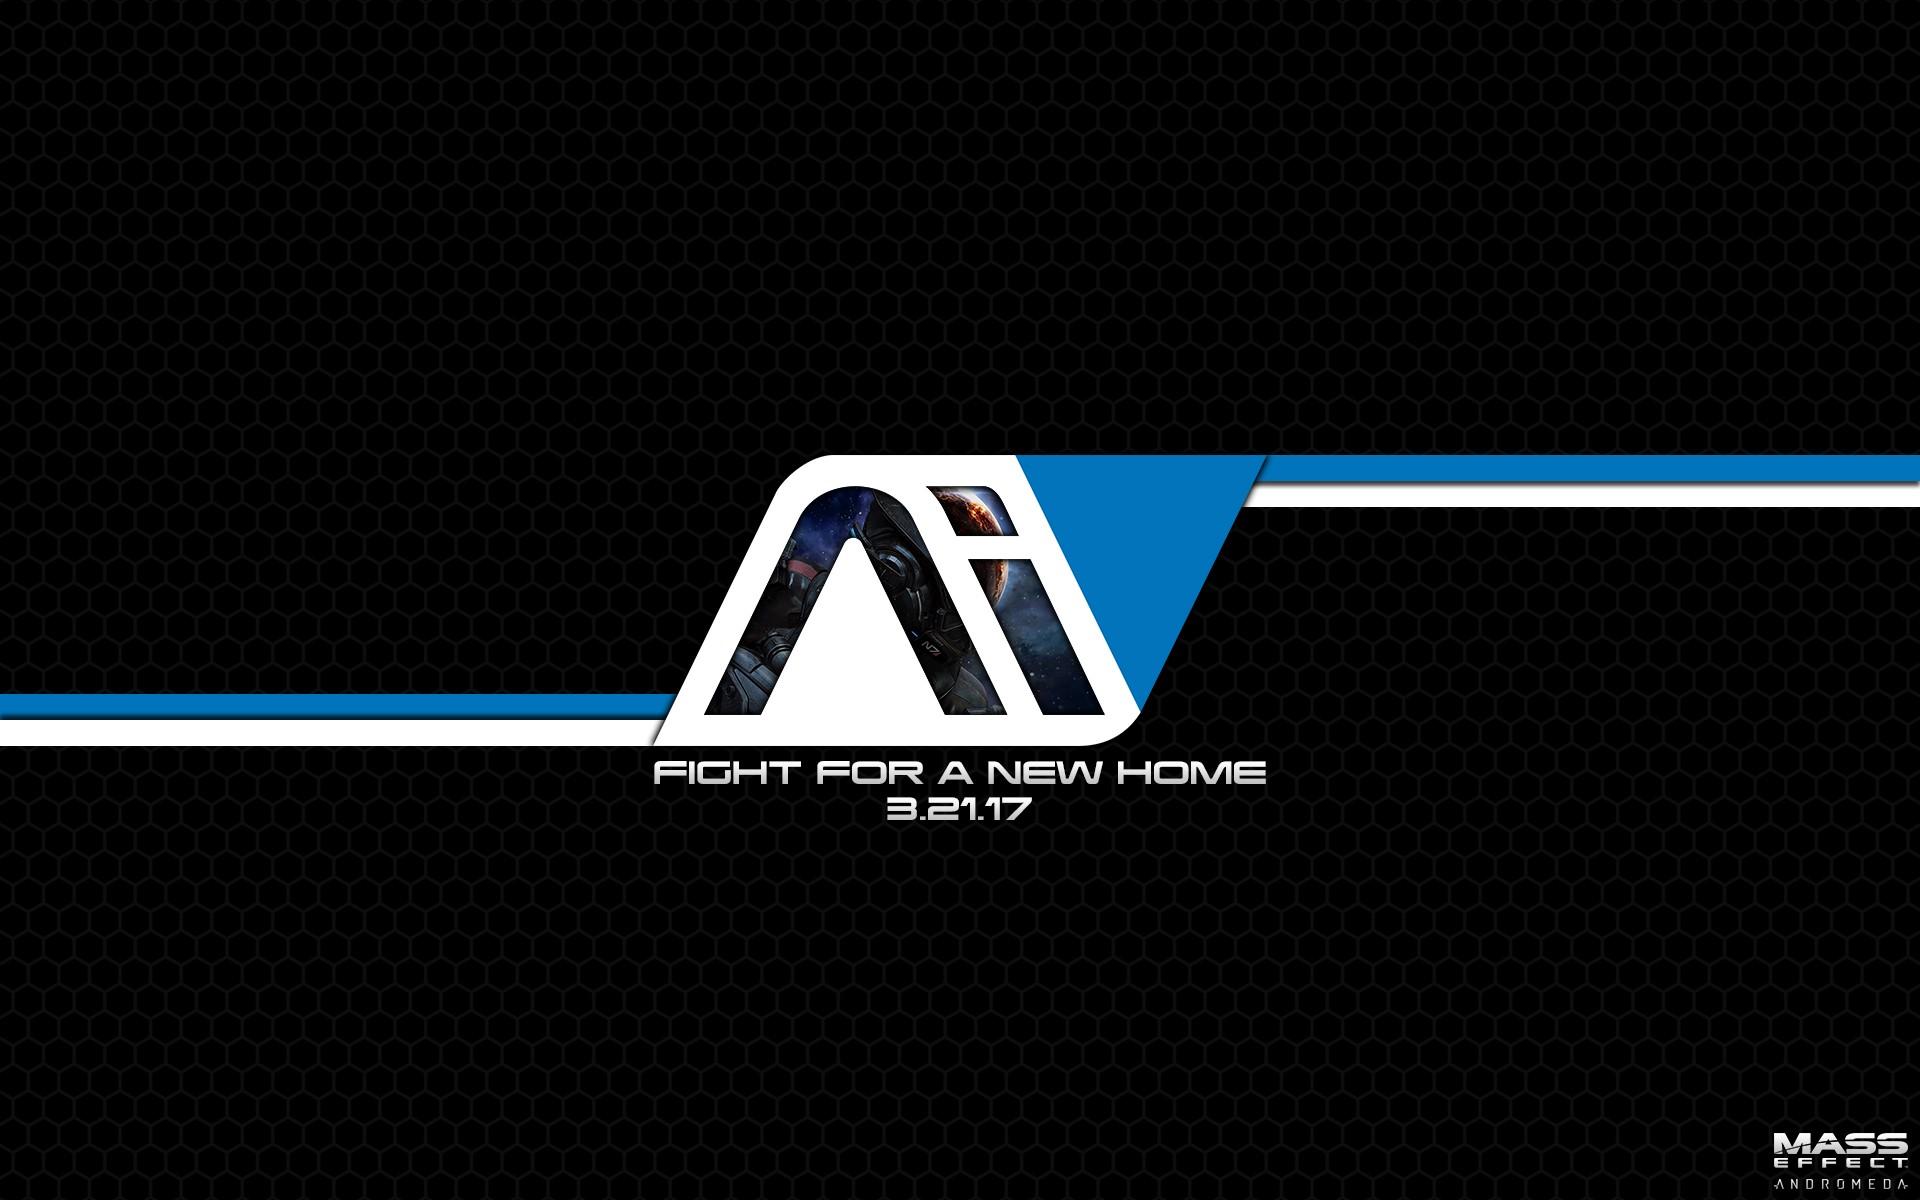 Wallpaper Mass Effect Mass Effect Andromeda Andromeda